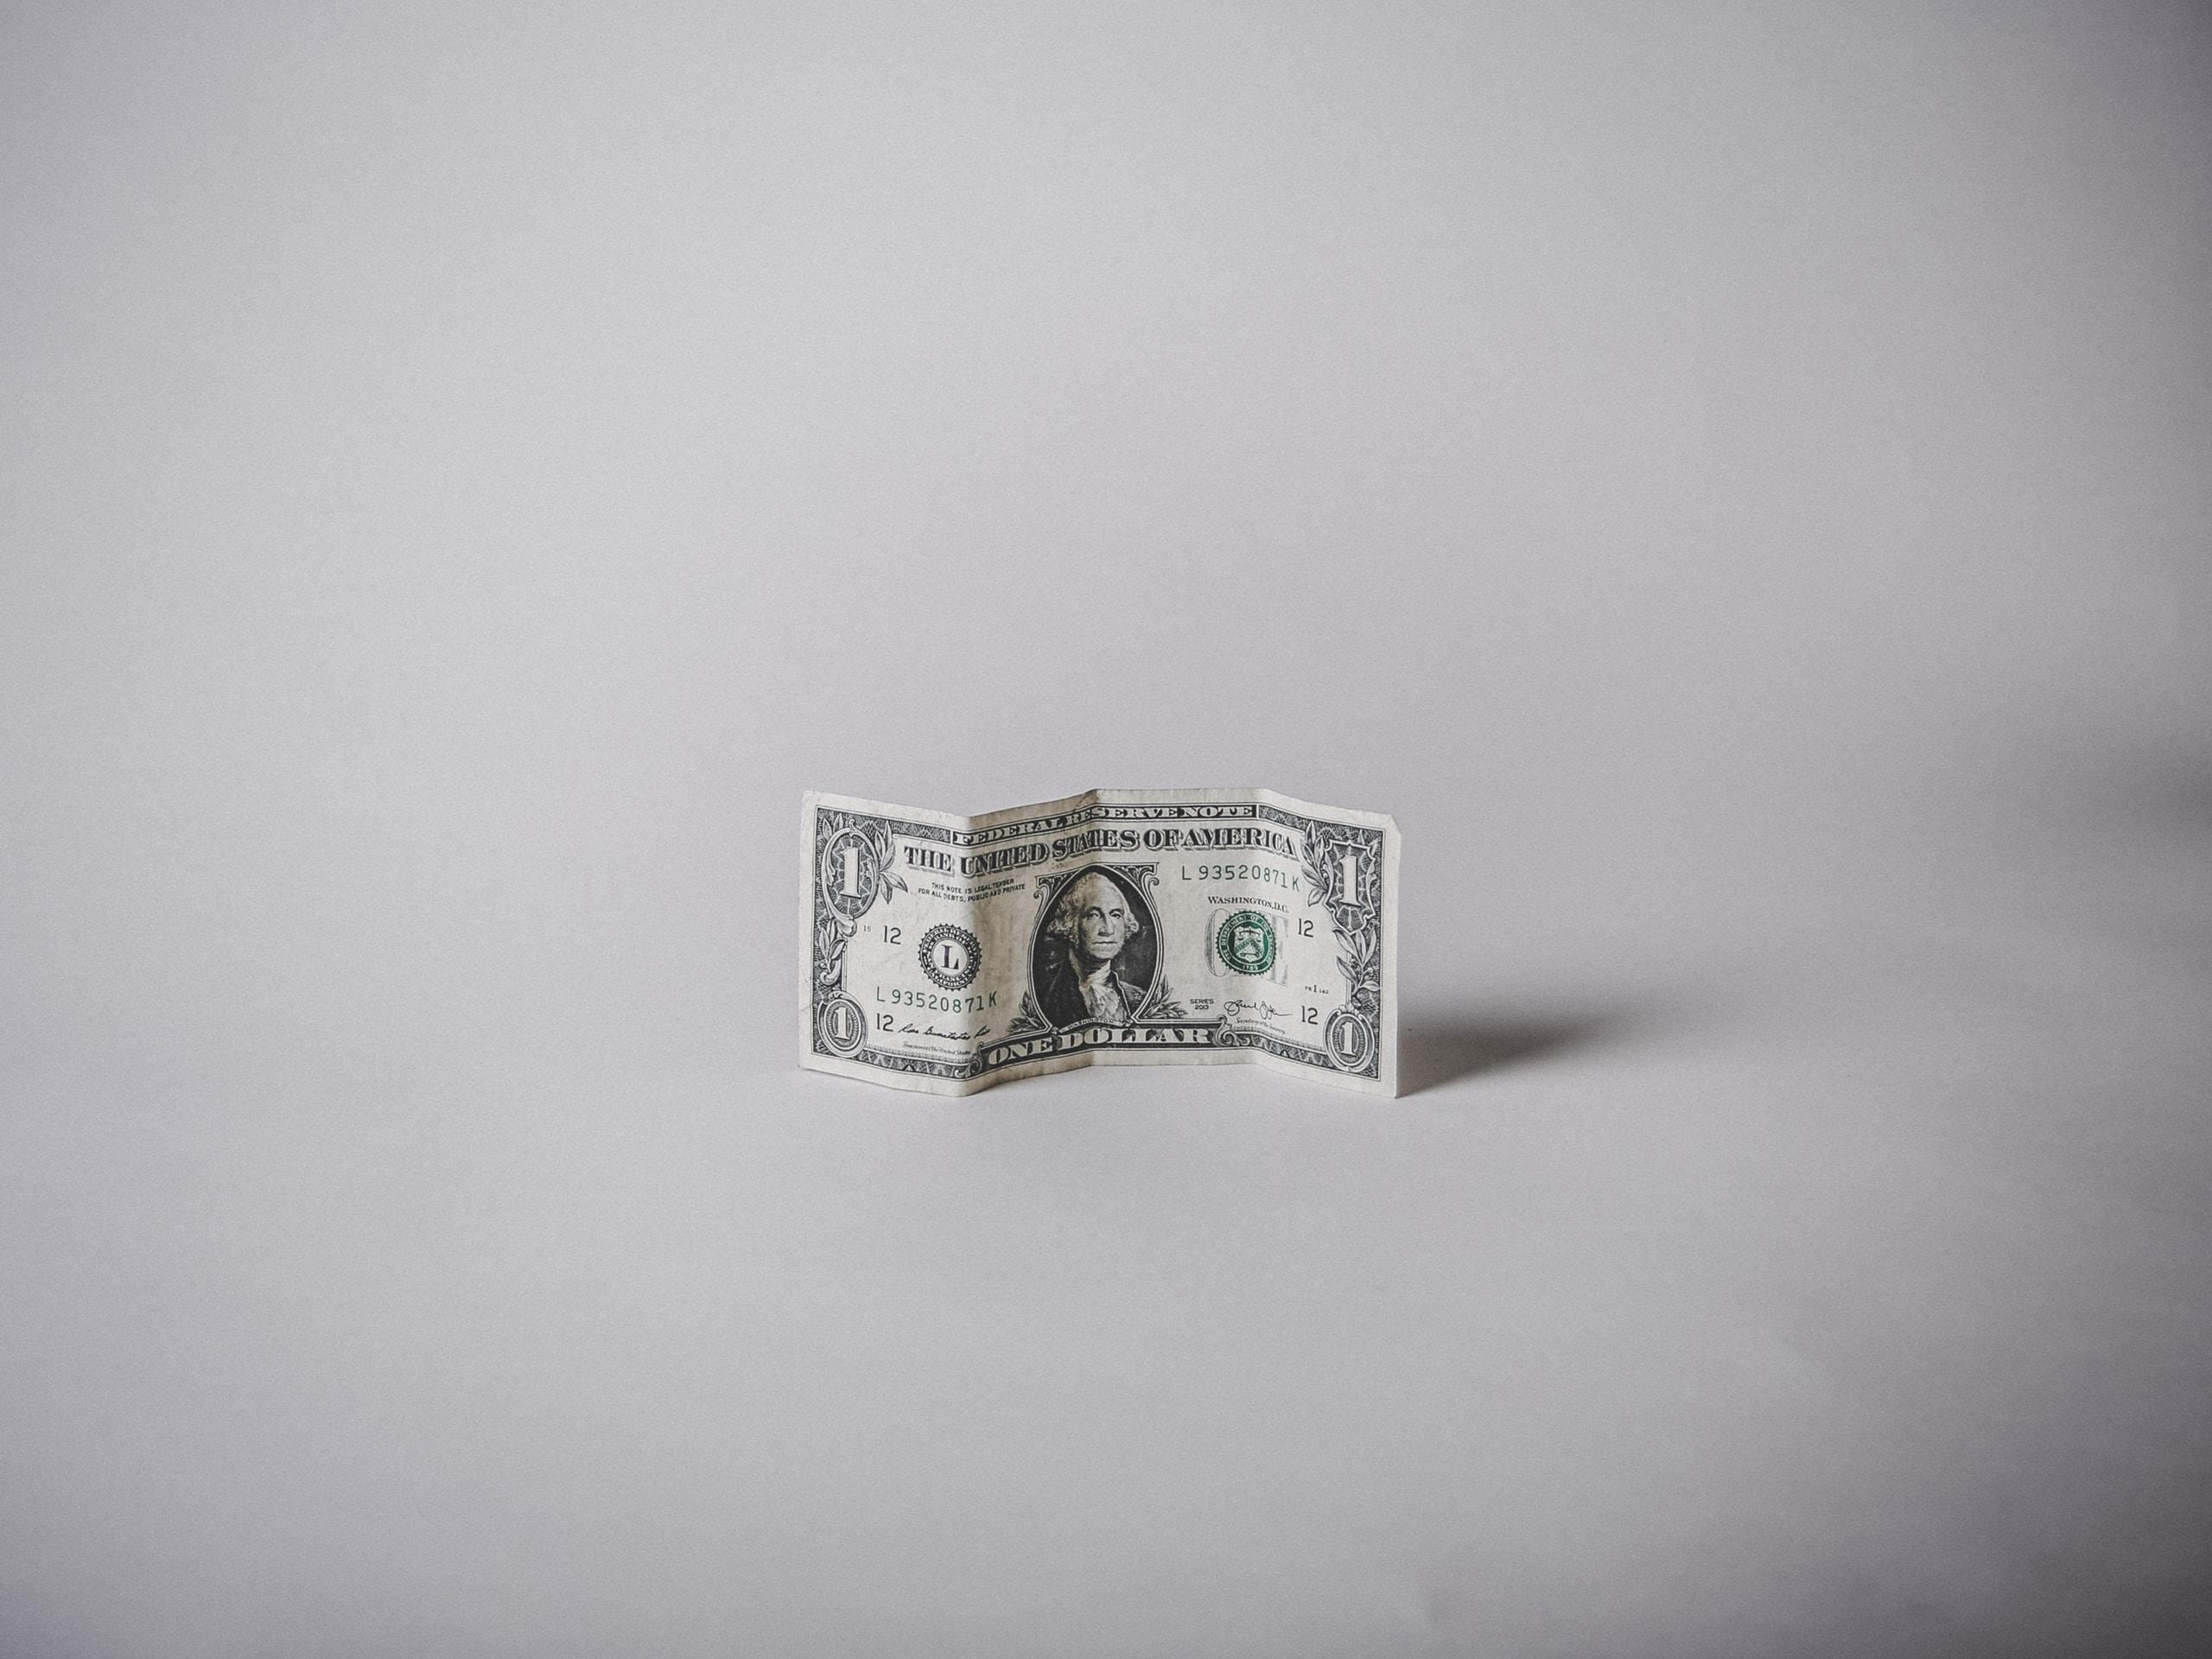 Dynamic Set Dollar (DSD)